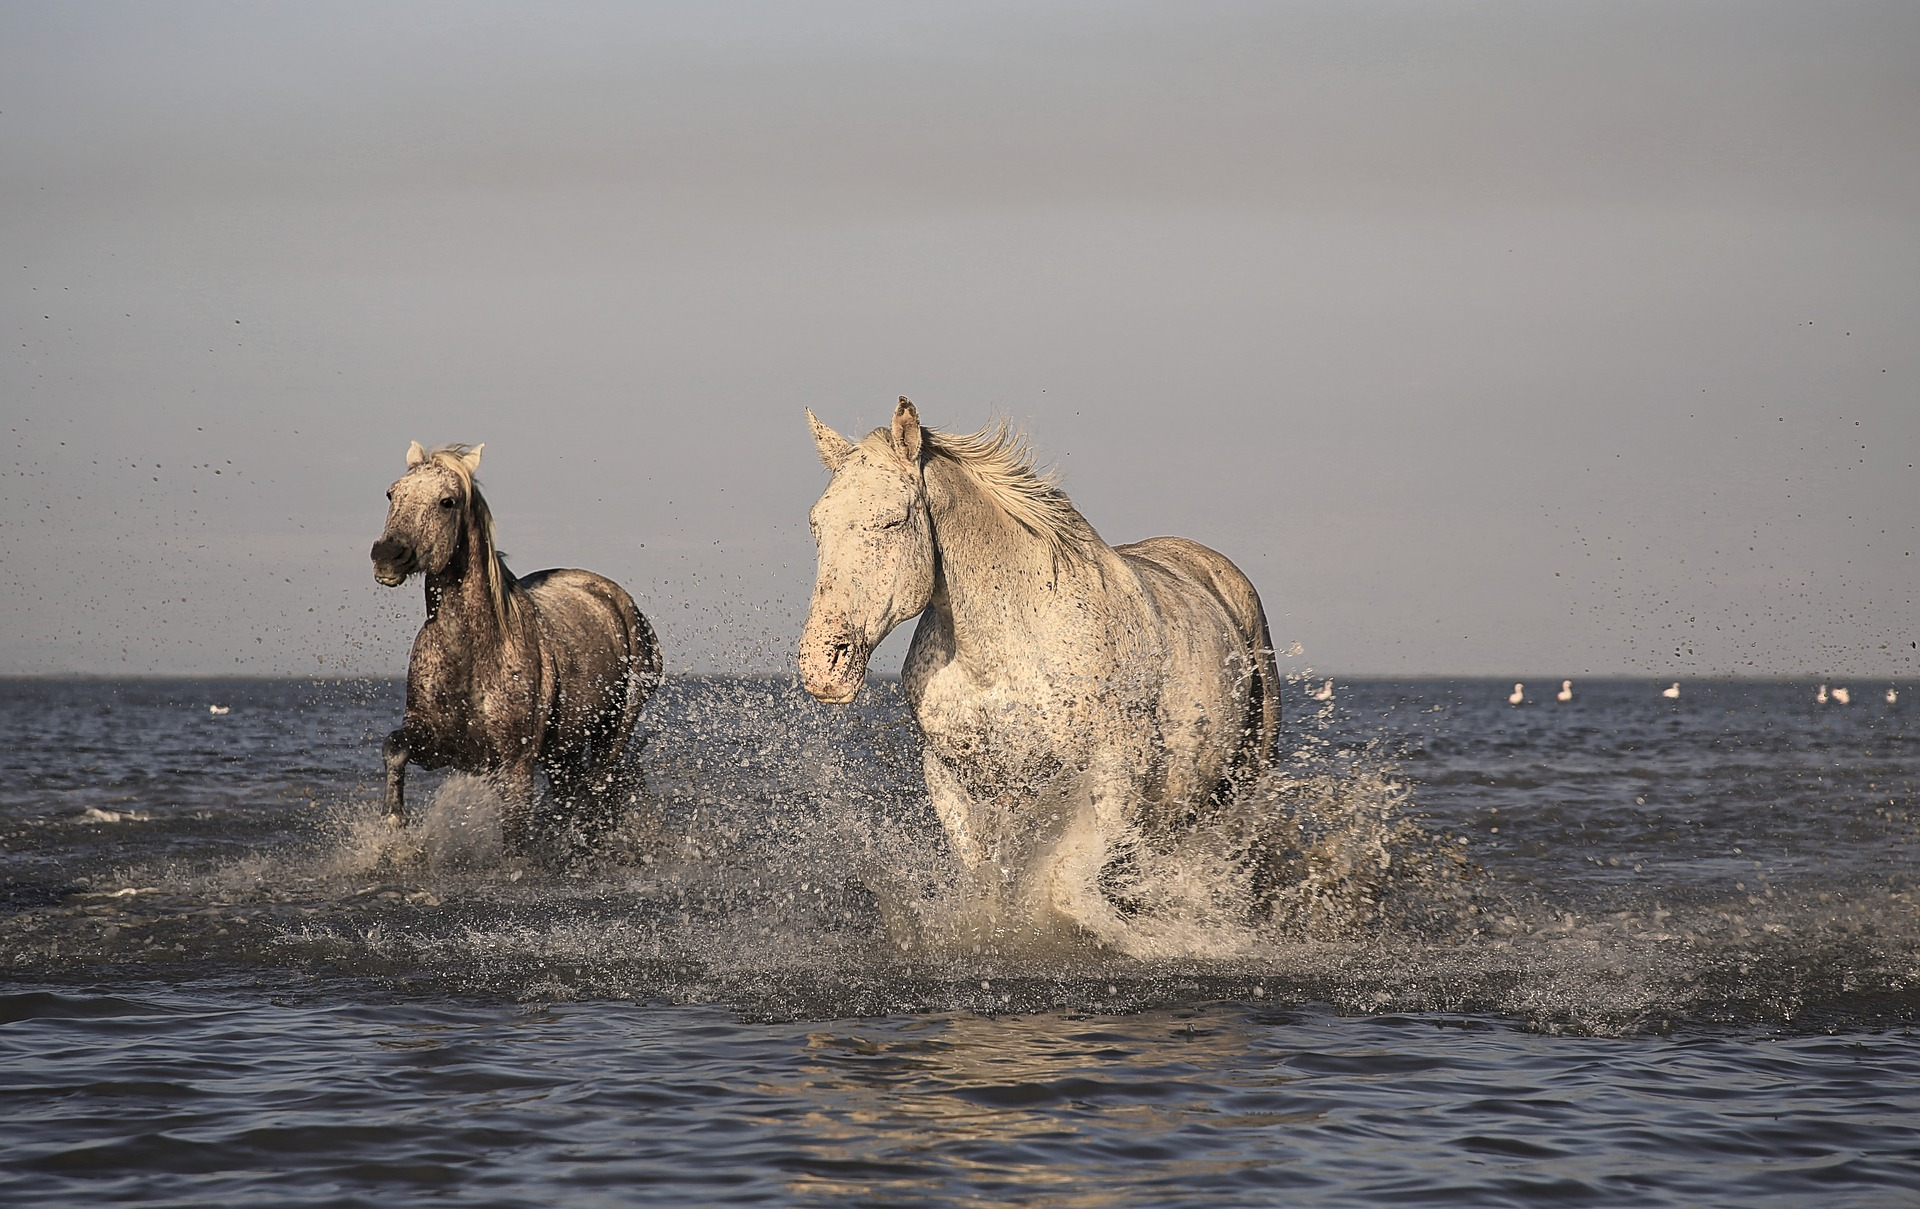 Cavalli Boscoforte